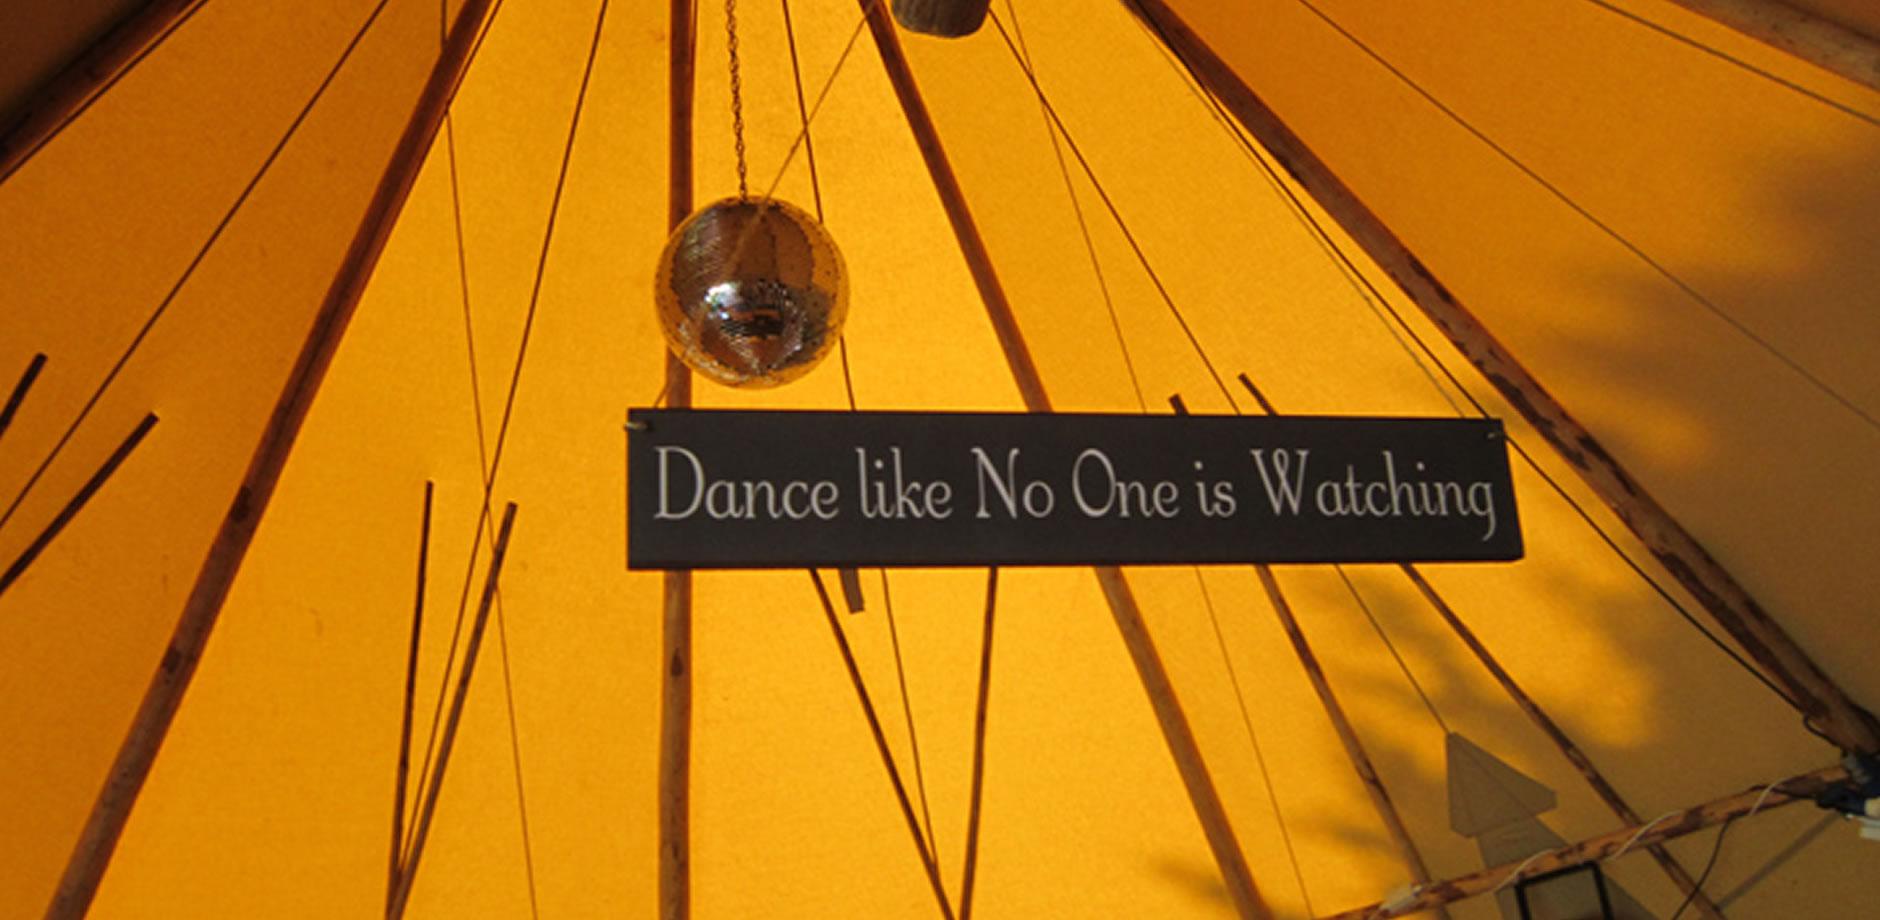 helen-robin-banner-dance